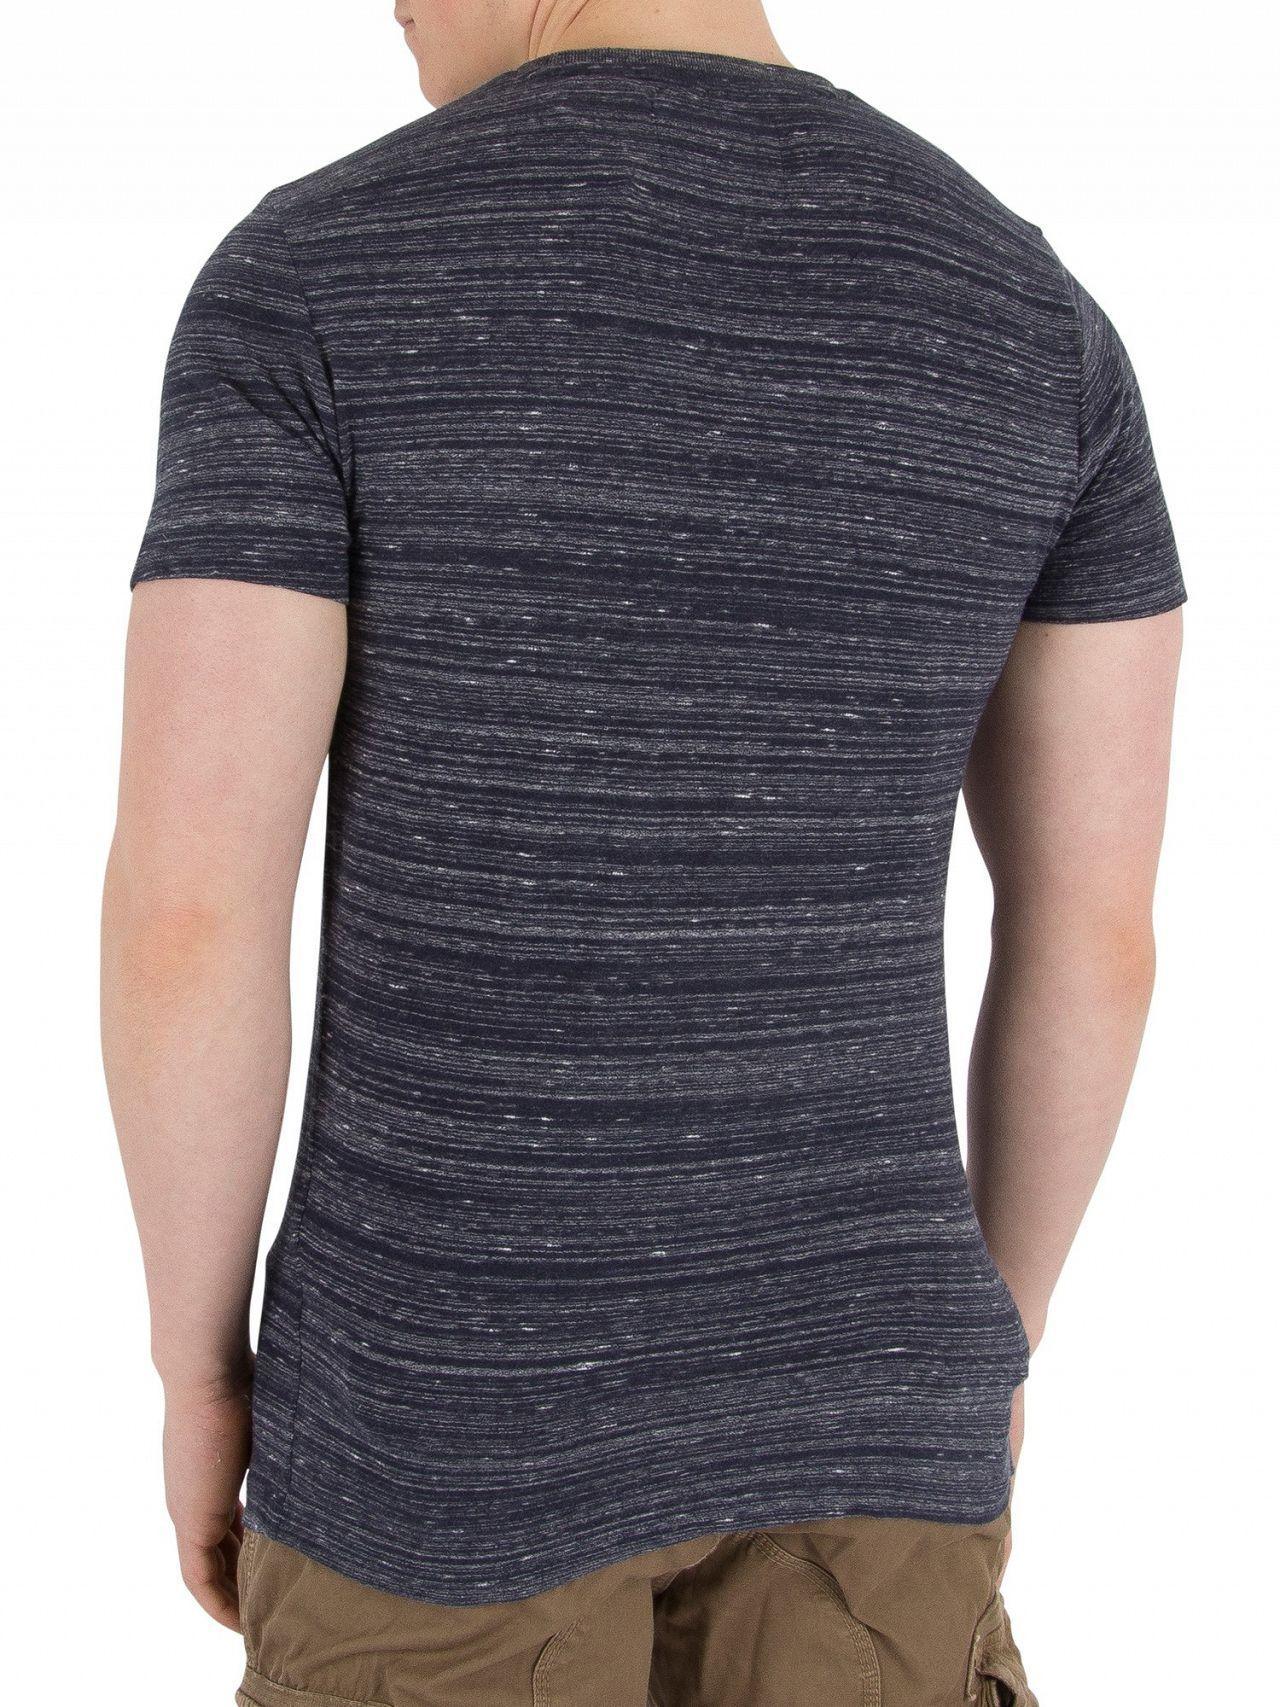 369387e0 Superdry Navy Space Dye Orange Label Vintage EMB T-Shirt | Standout